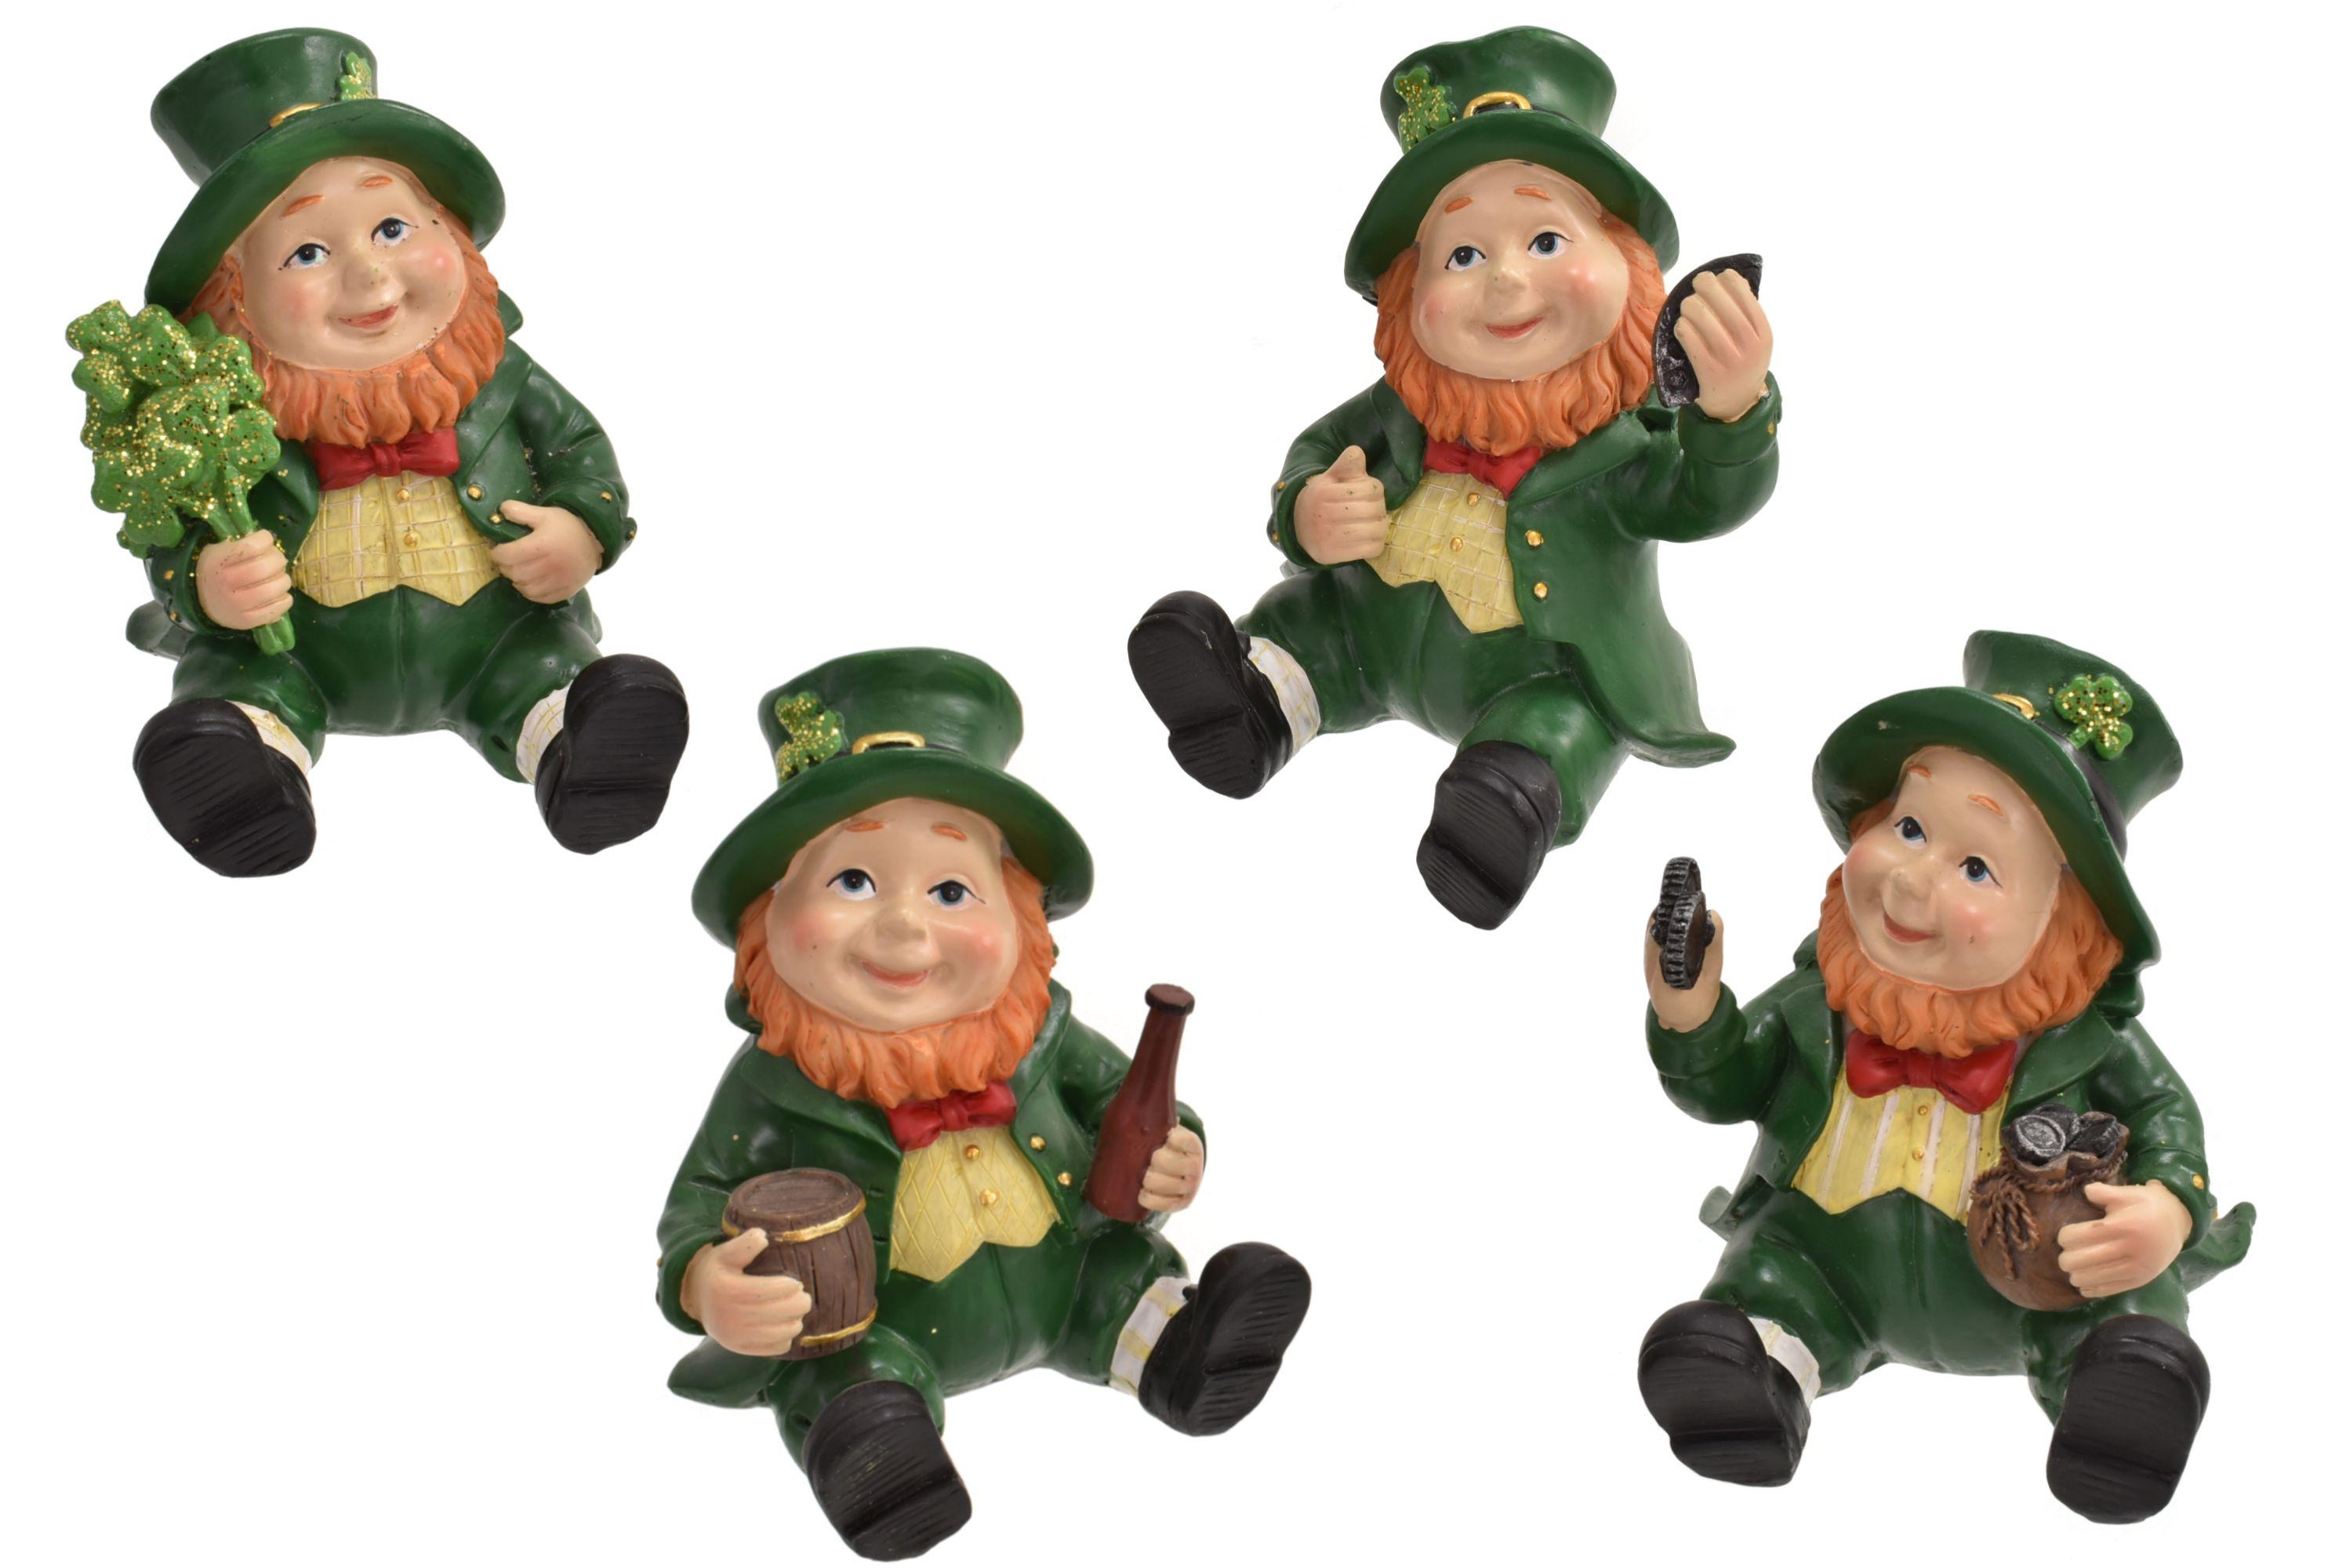 Polyresin Laying Leprechaun Figurines 4 Asst Designs